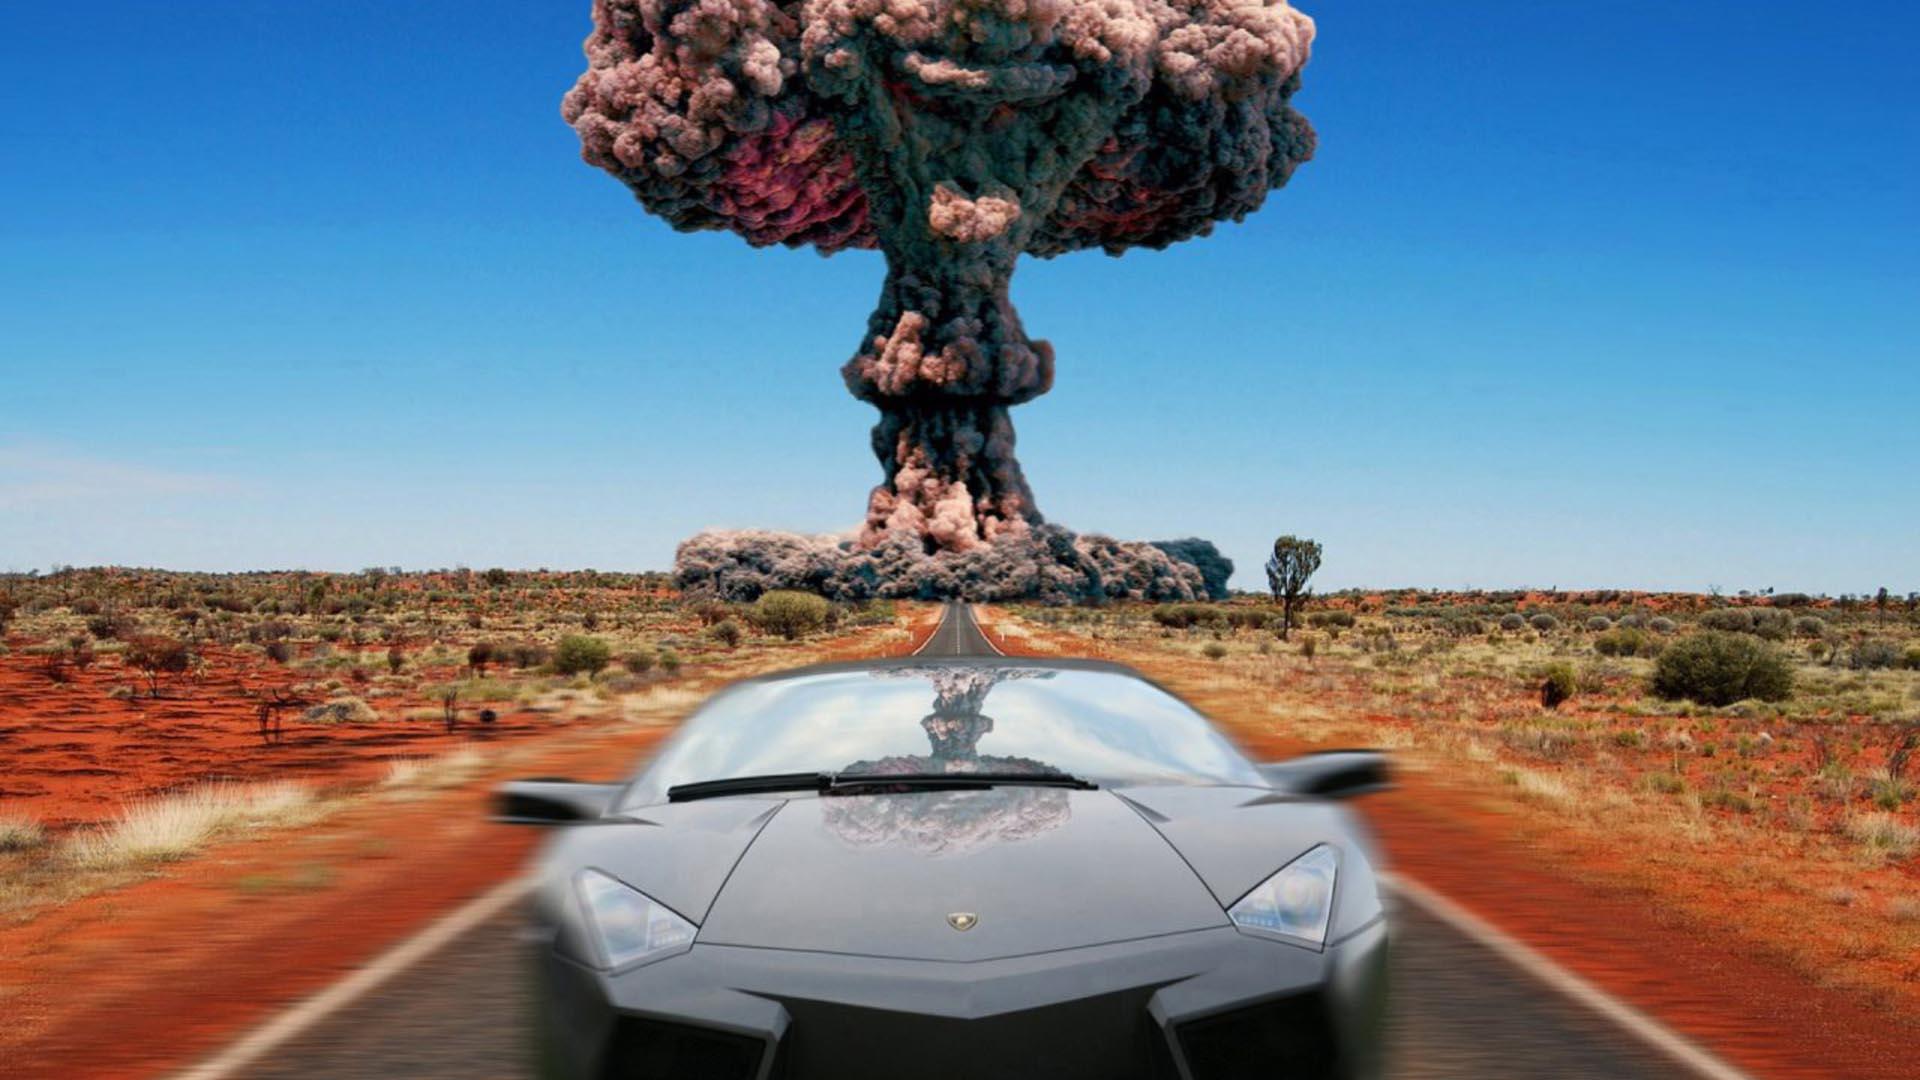 World Best SuperCar Lamborghini Wallpaper 14   SA Wallpapers 1920x1080